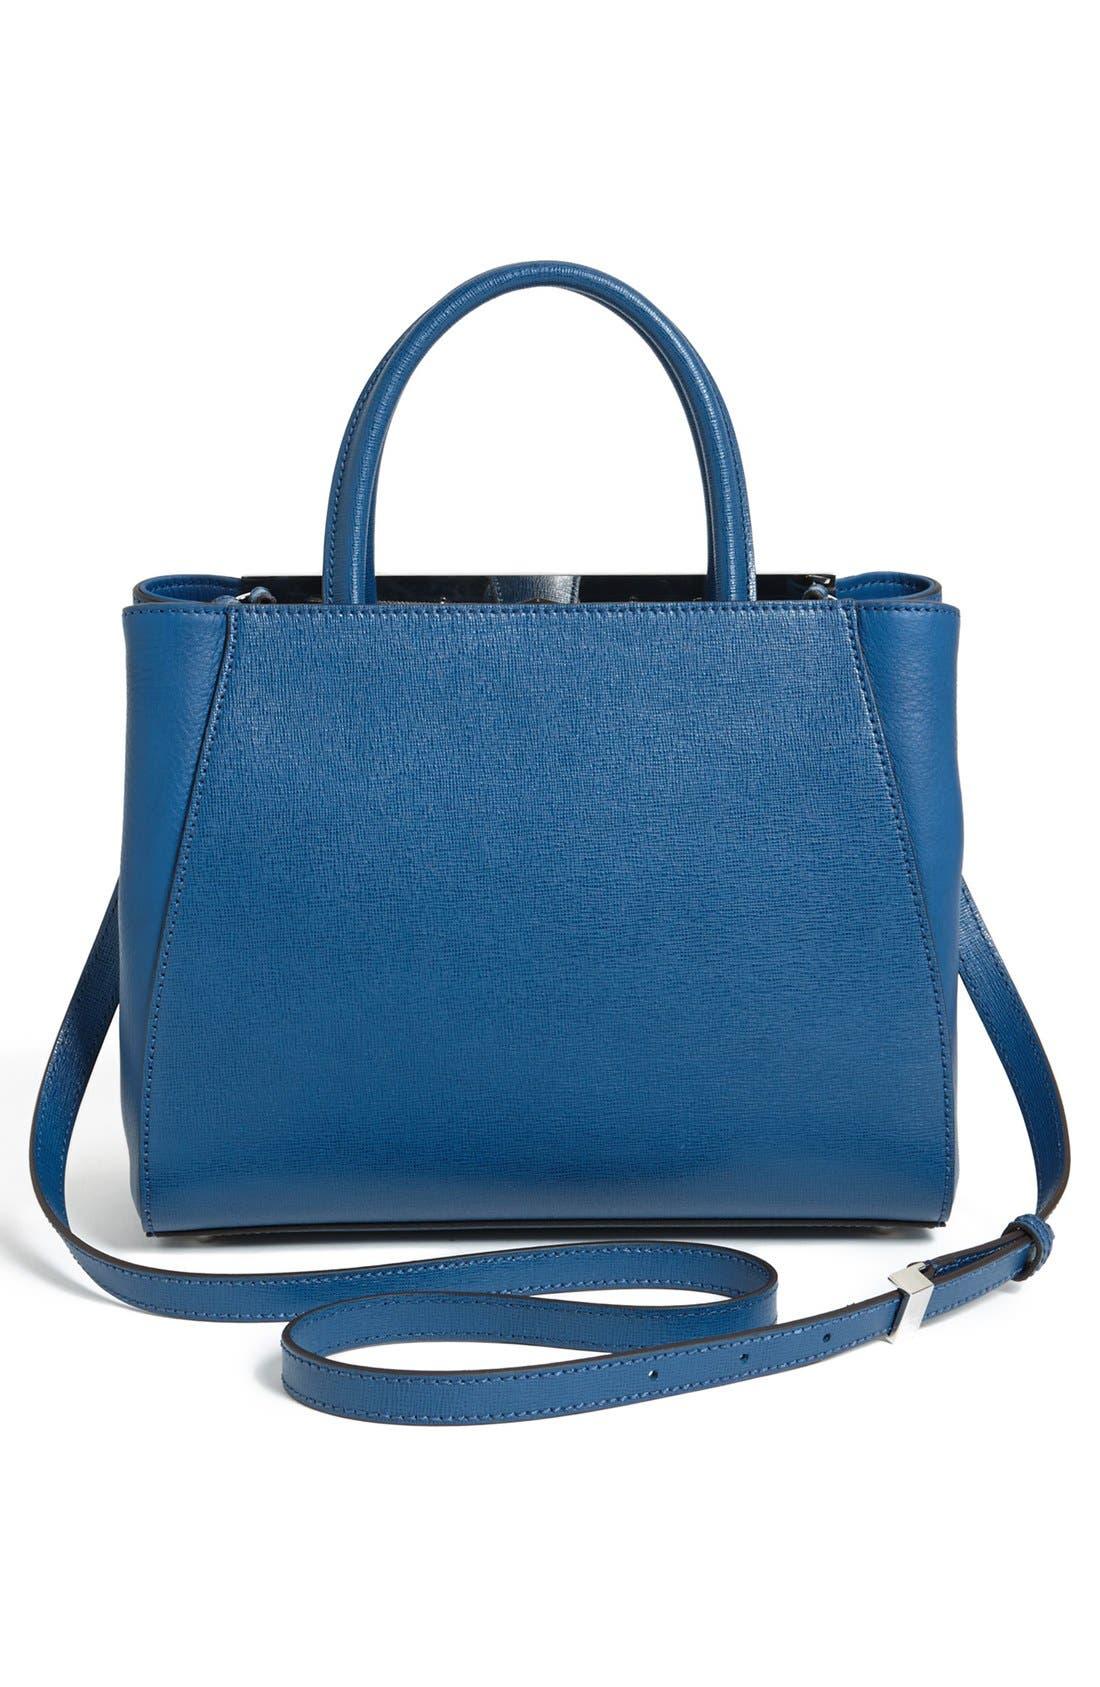 Alternate Image 3  - Fendi 'Petite 2Jours Elite' Leather Shopper